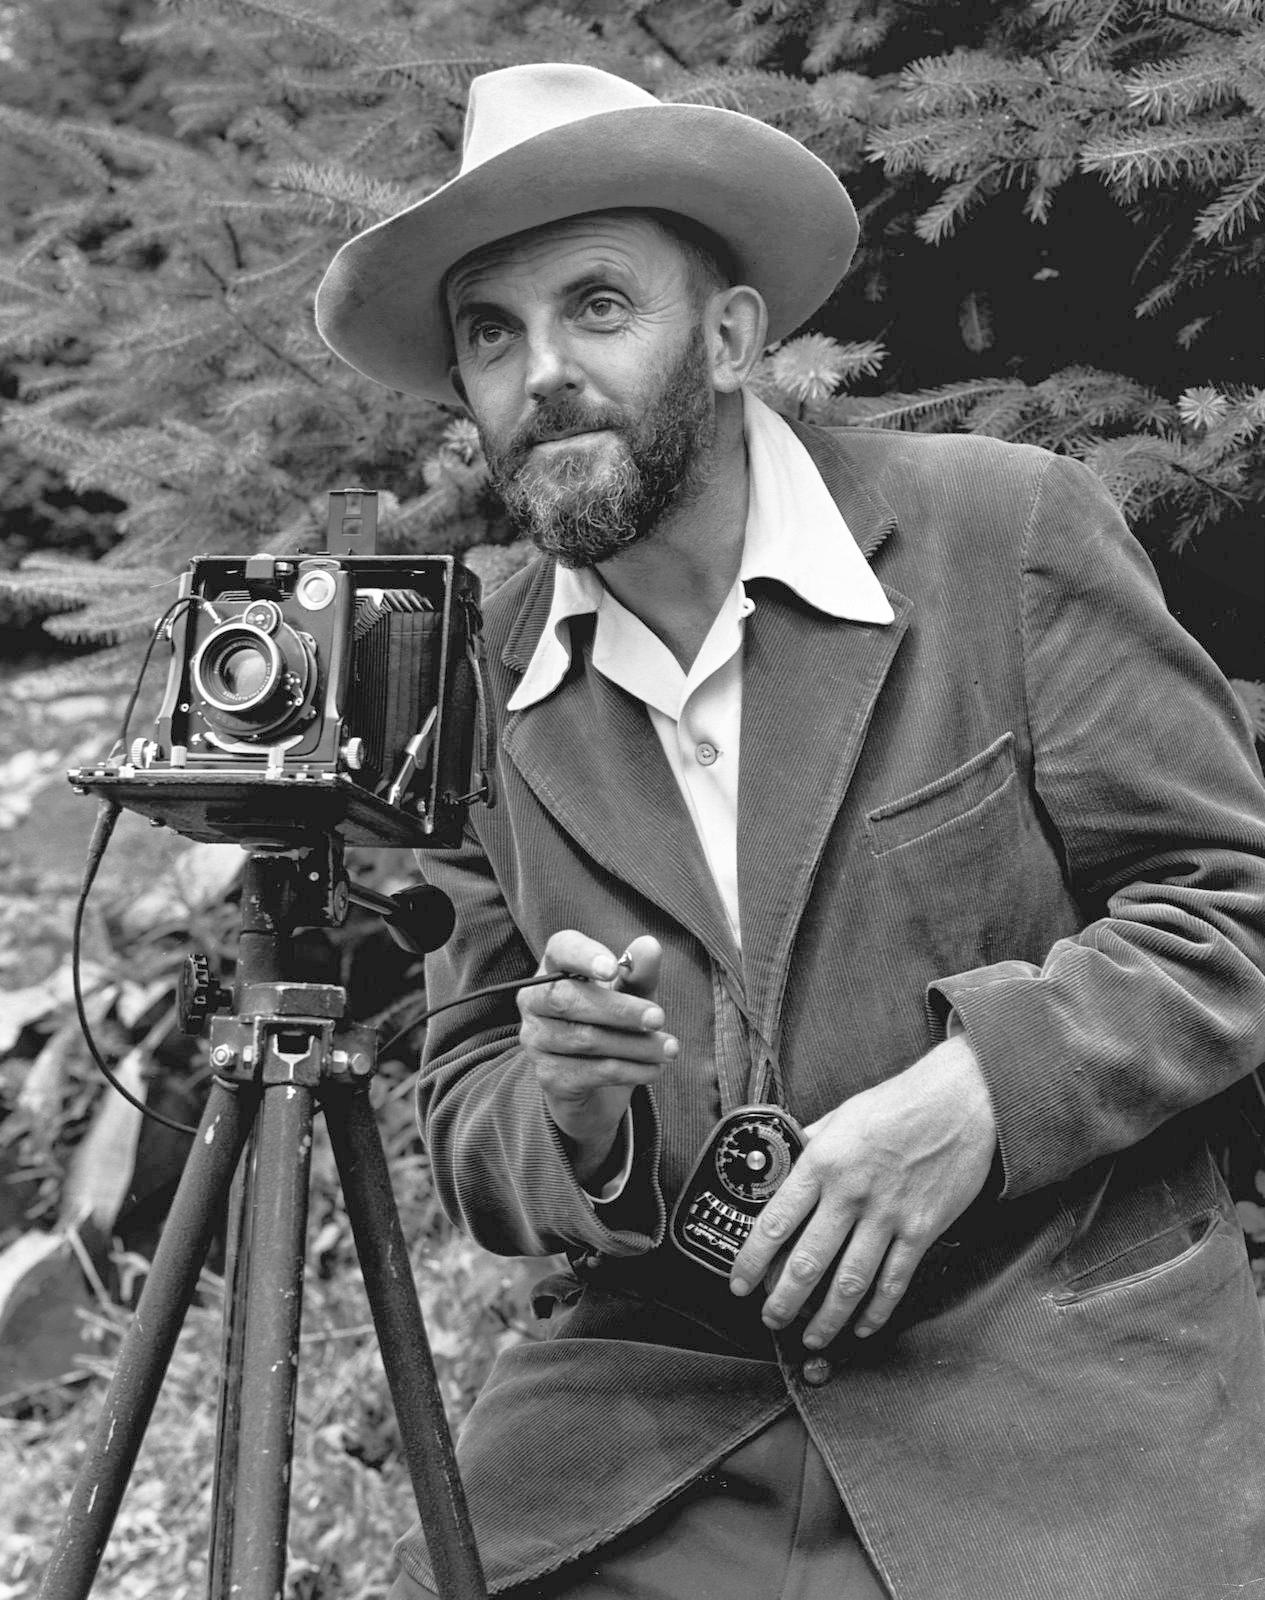 Ansel-Adams-Portrait-Youthephotographer